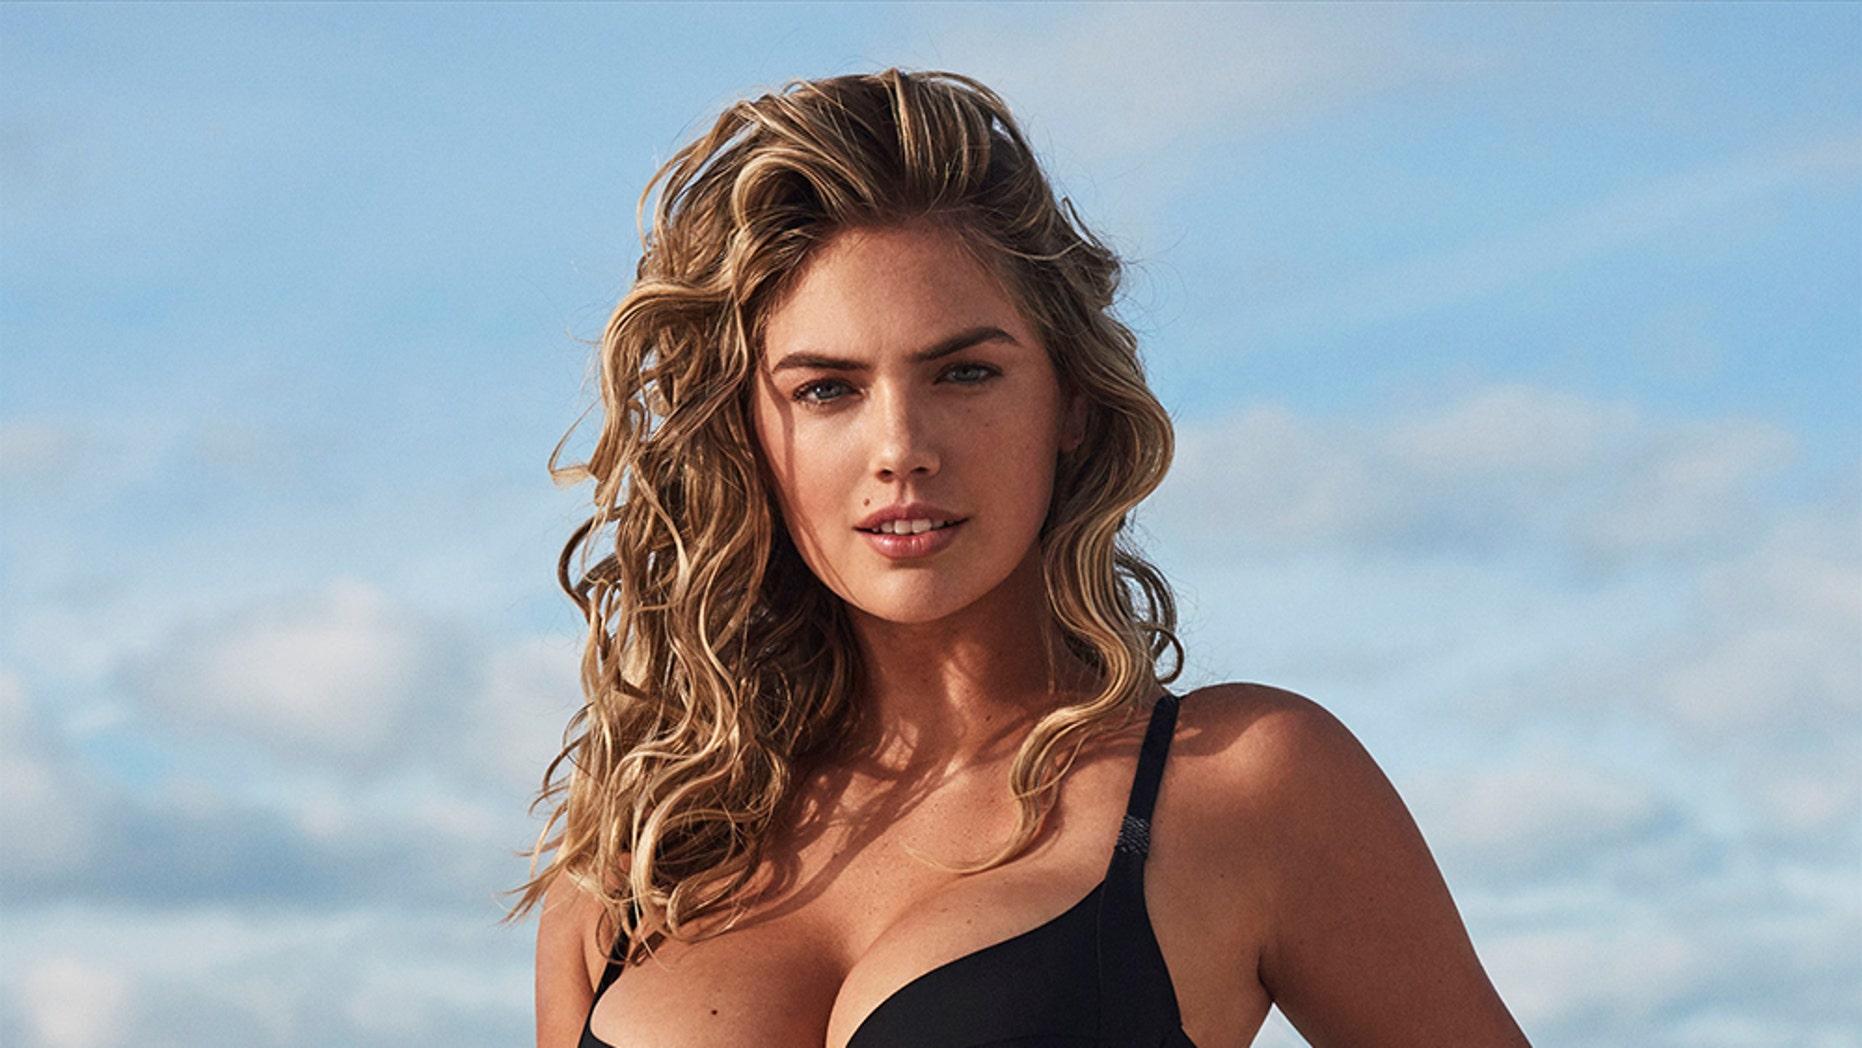 MARIA: Hot Bikini Models Stripping